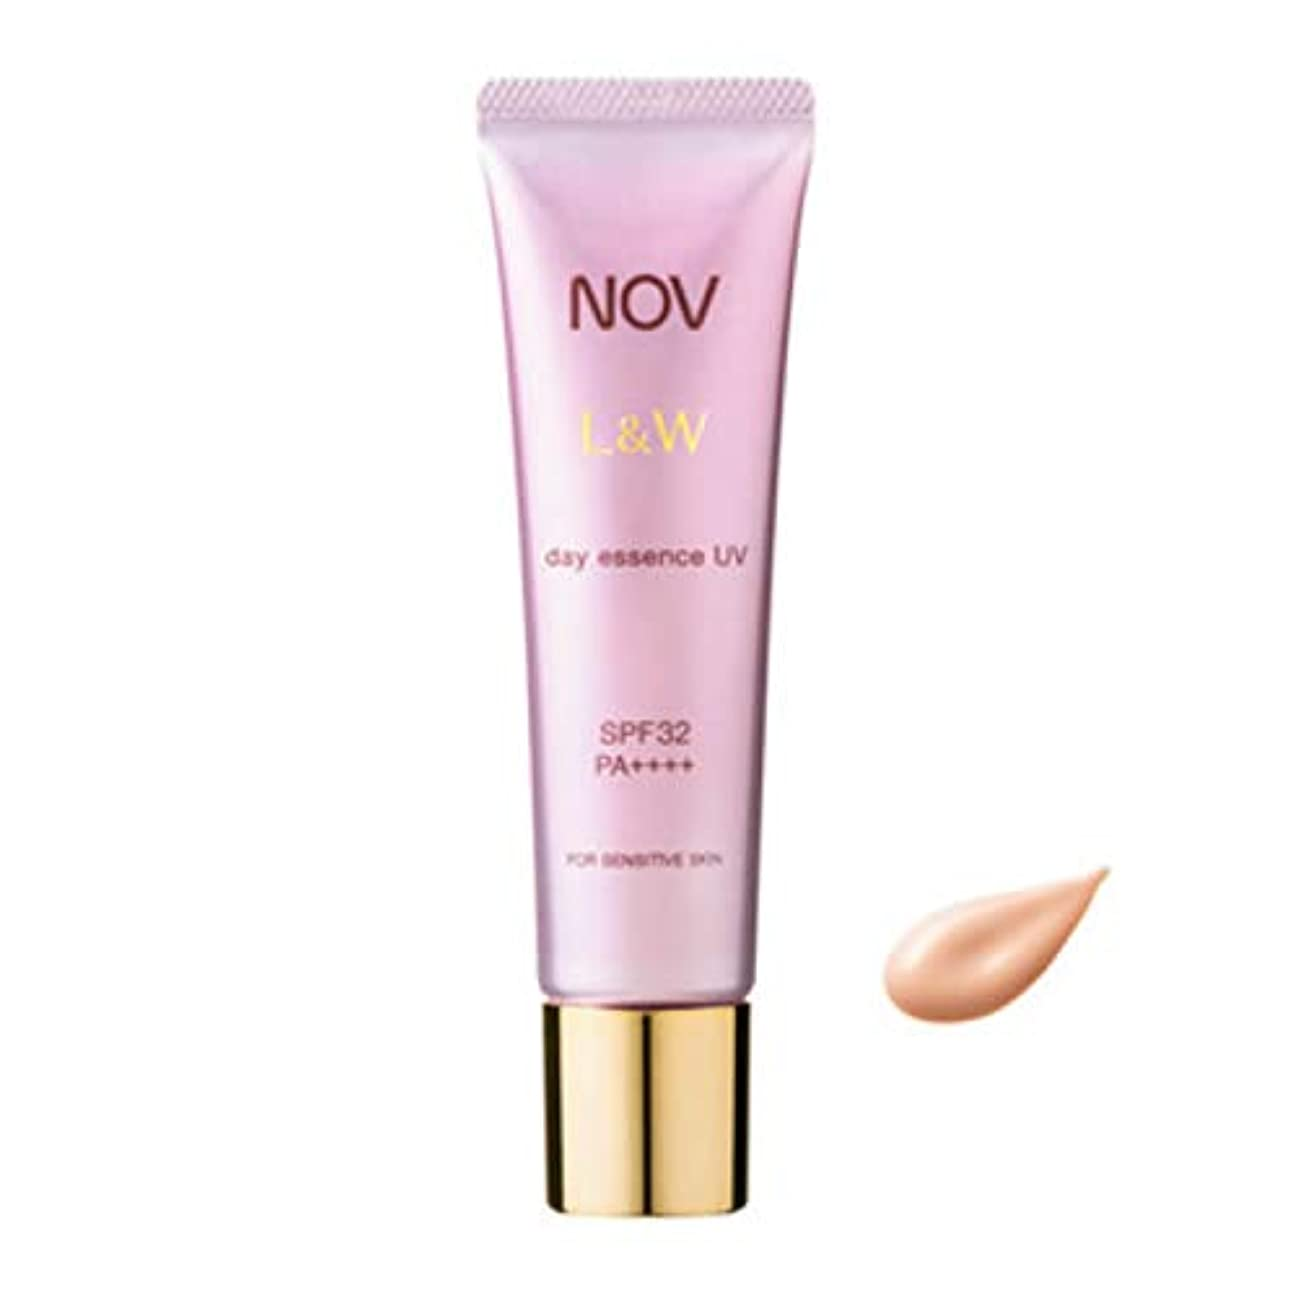 NOV ノブ L&W デイエッセンス UV 30g 日中用美容液 SPF32?PA++++ [並行輸入品]